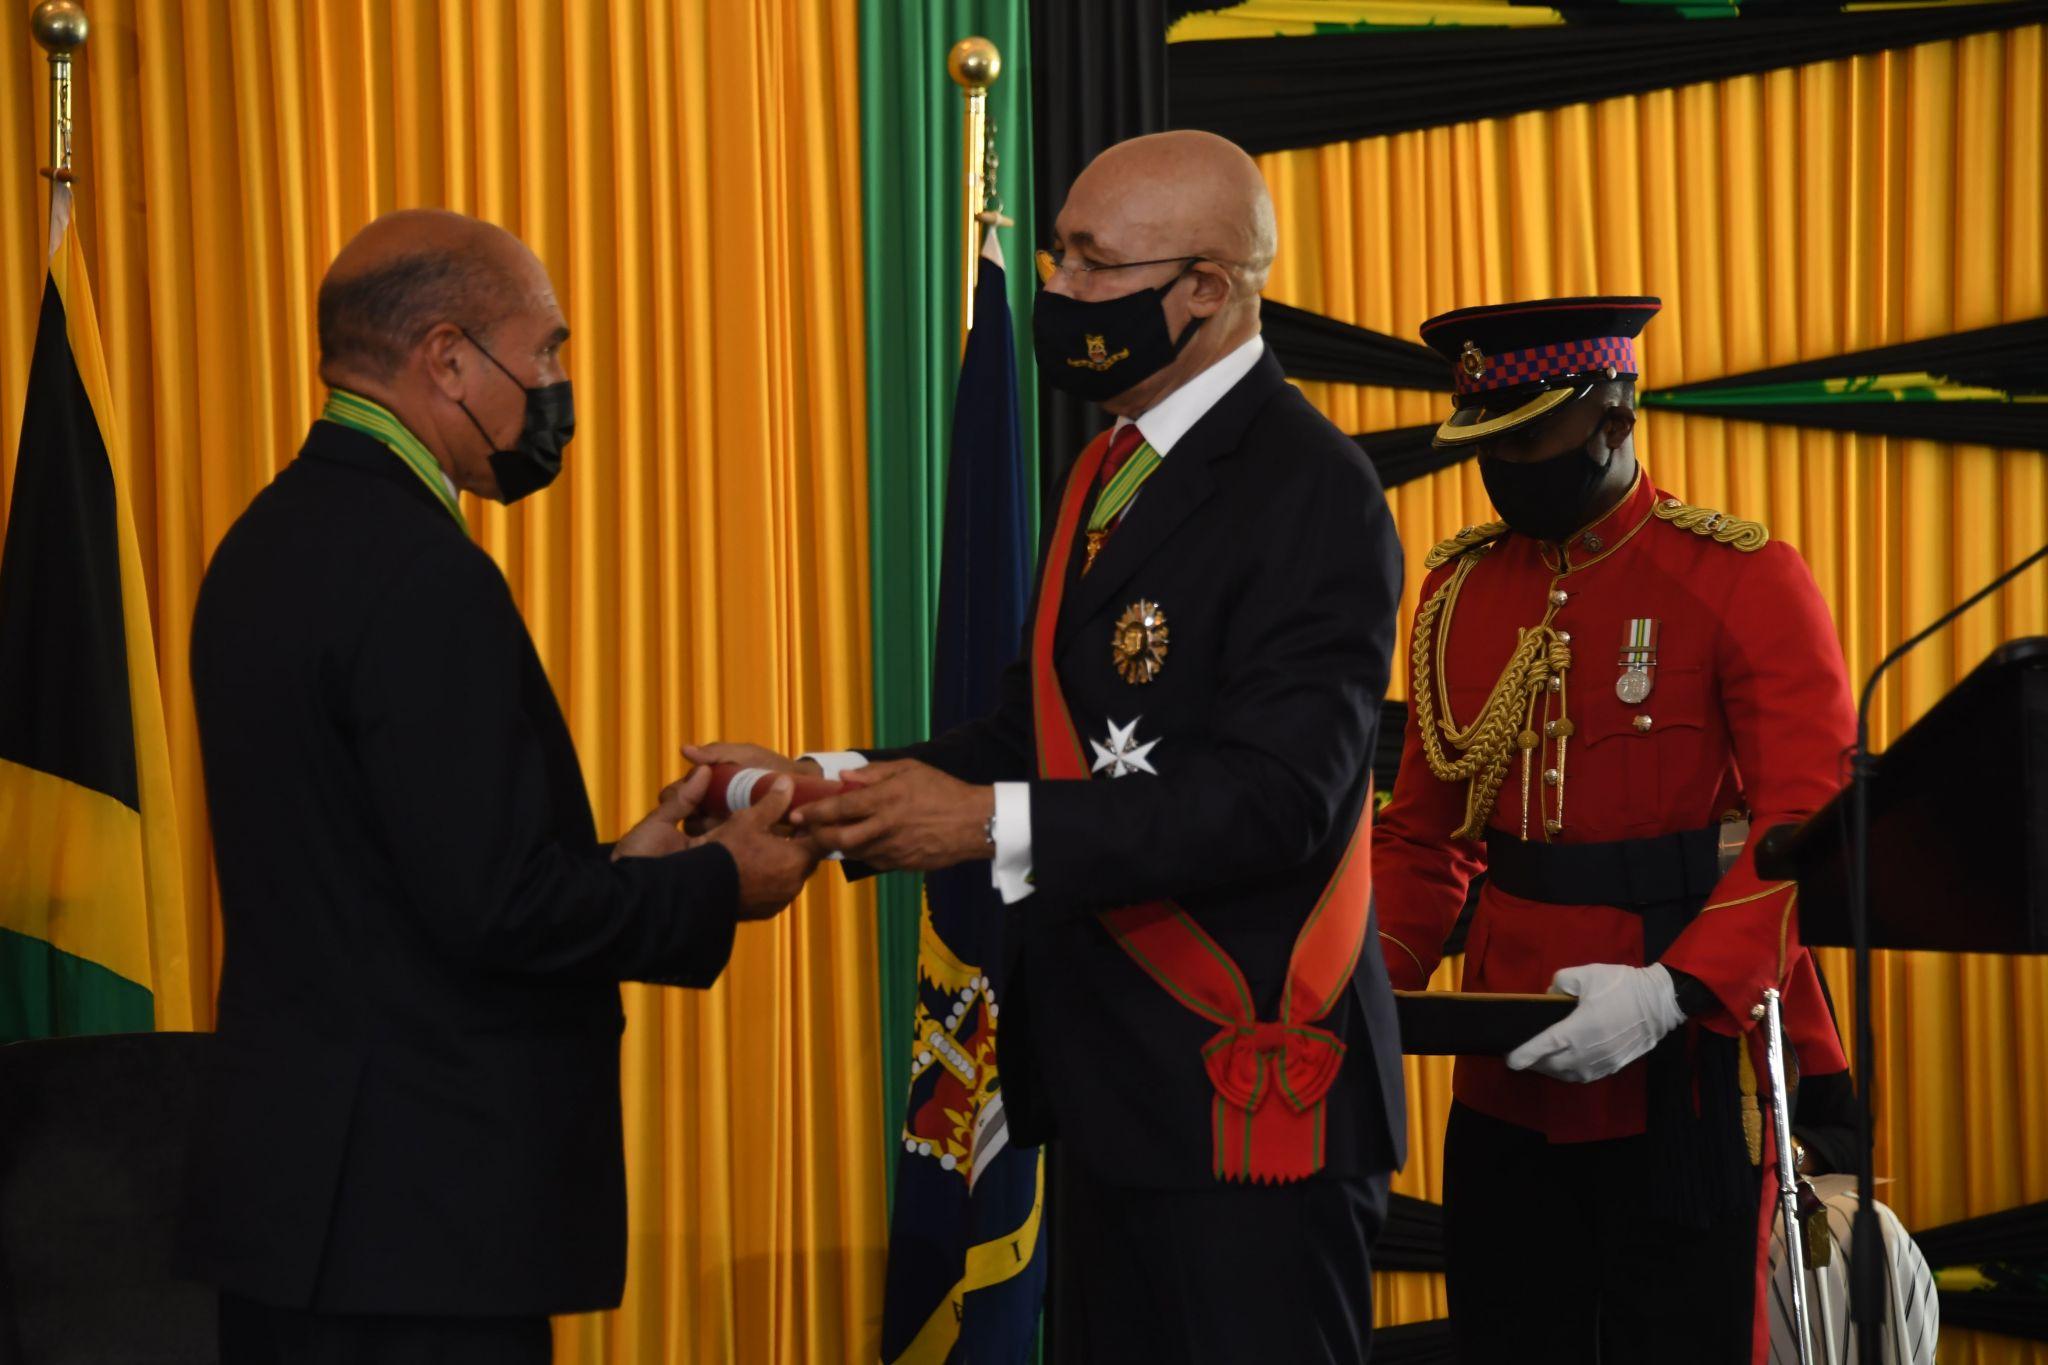 Governor-General Installs Hugh Gentles as Custos of Trelawny